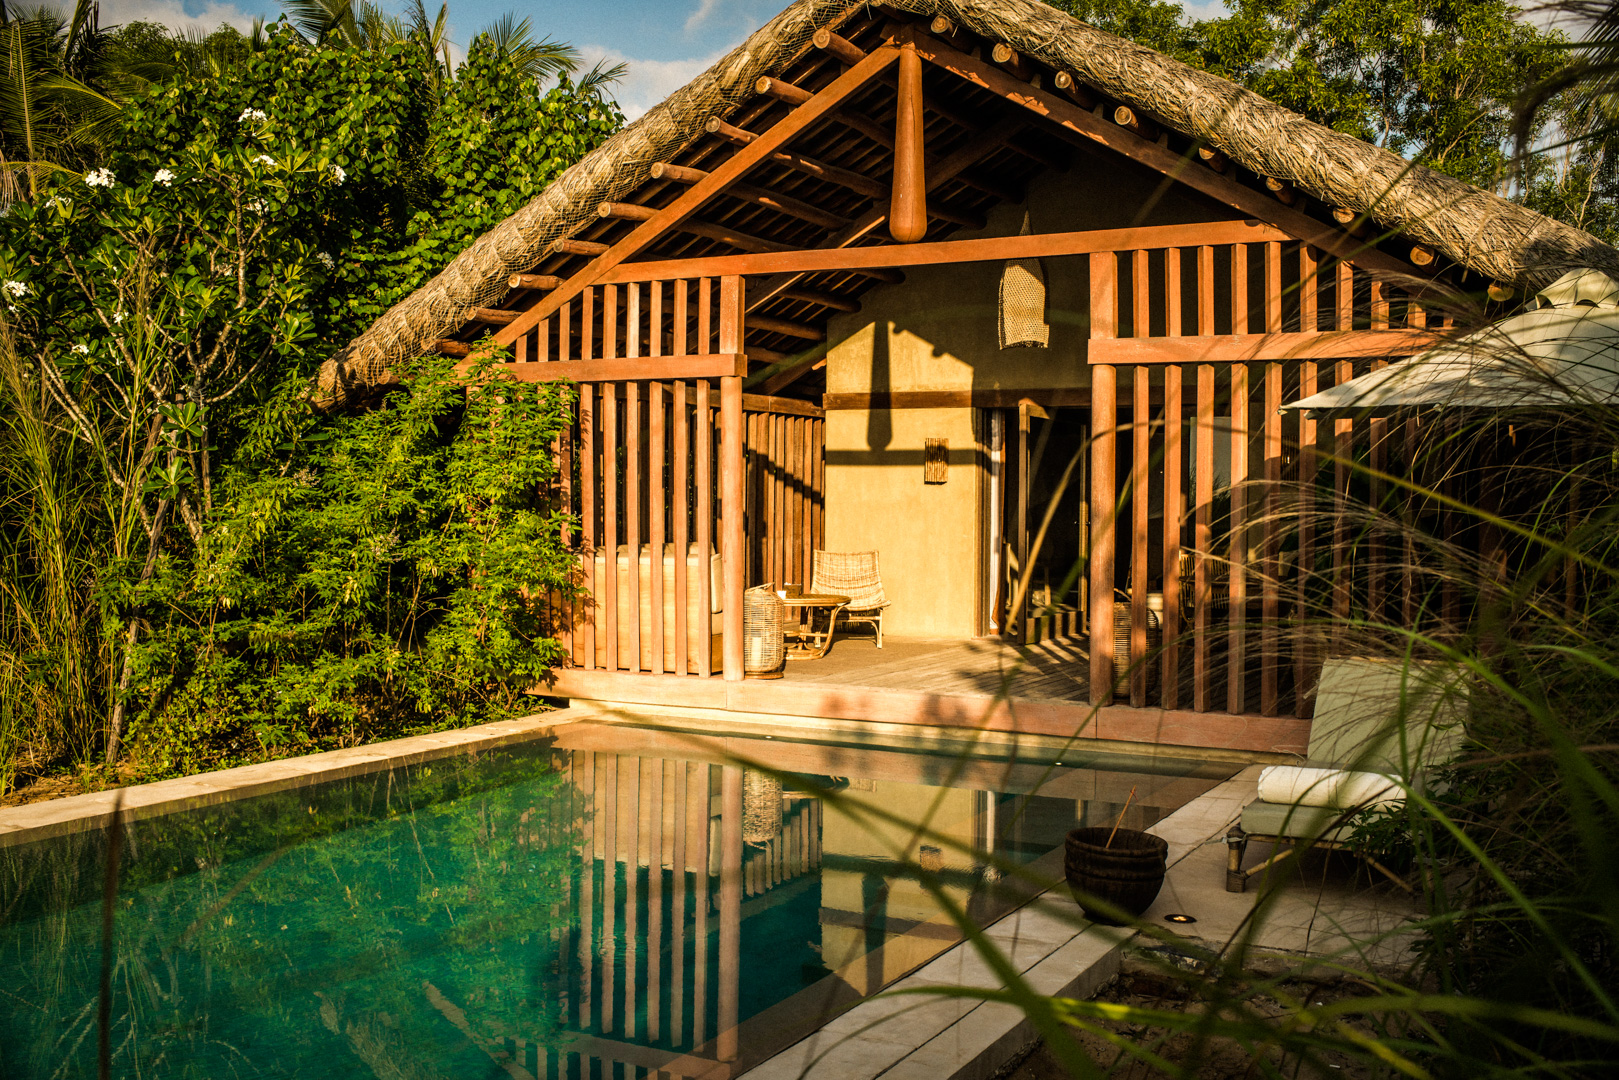 Zannier-Hotels-Bãi-San-Hô-Beach-Pool-Villa-Exterior-5-©-Frederik-Wissink-for-Zannier-Hotels